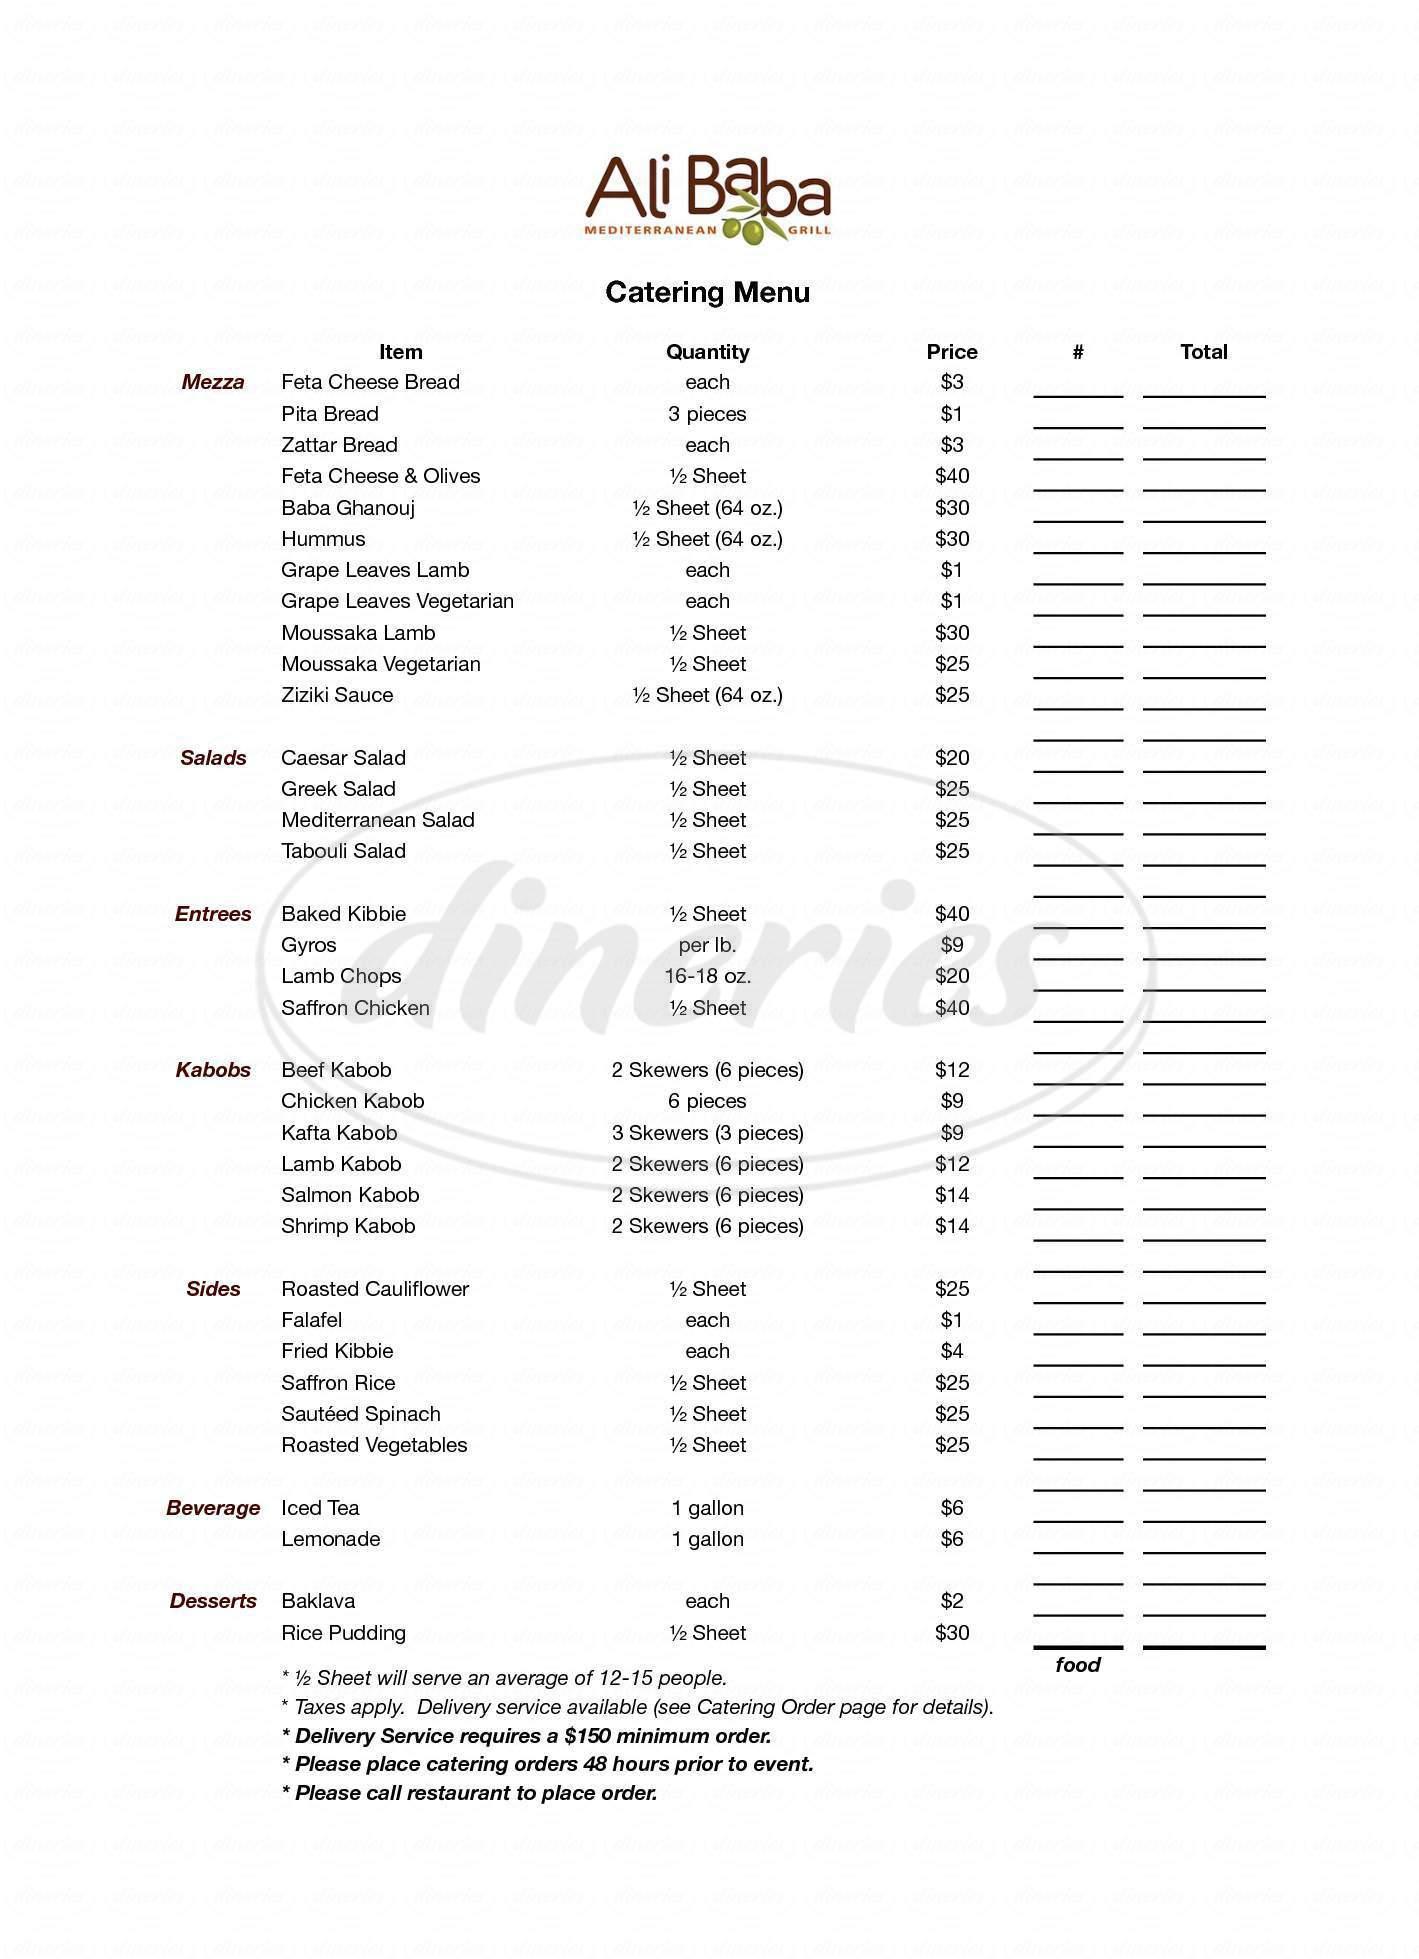 menu for Ali Baba Mediterranean Grill